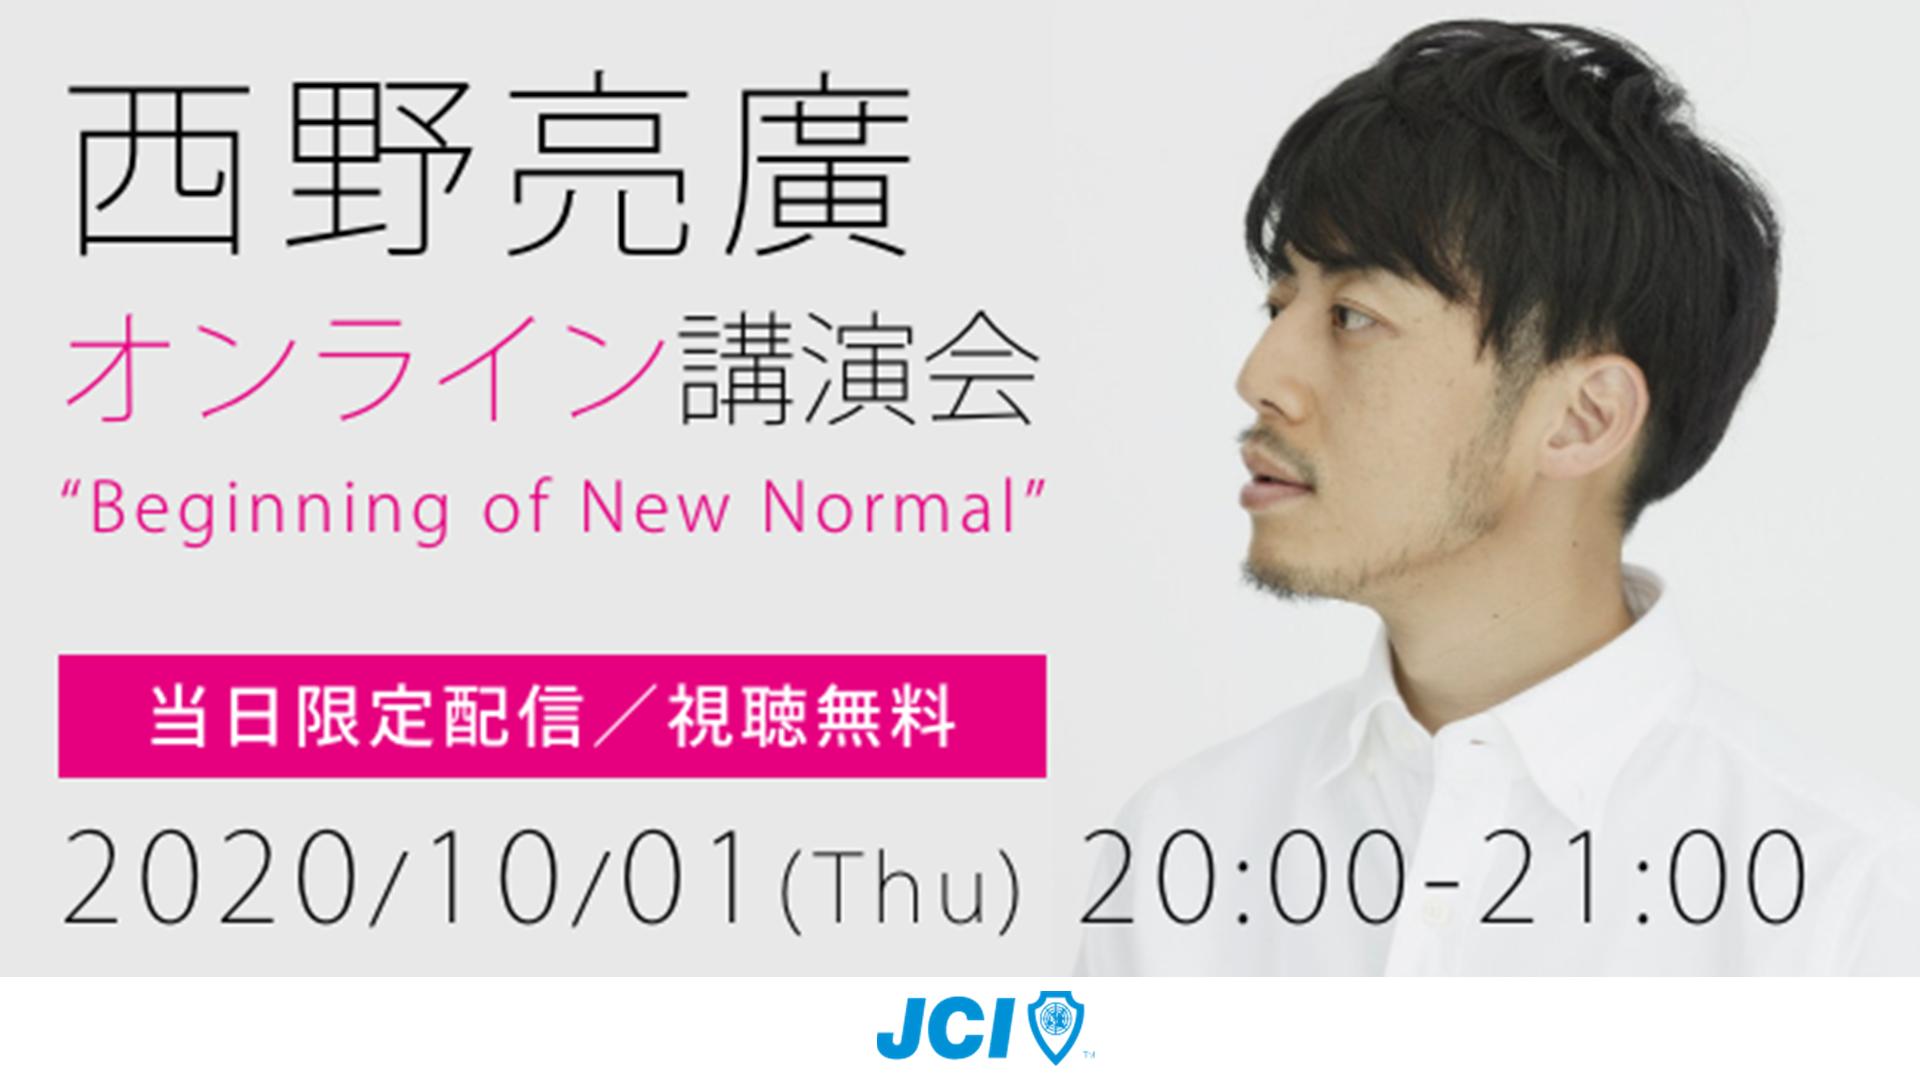 JCI 公益社団法人 日本青年会議所 近畿地区協議会